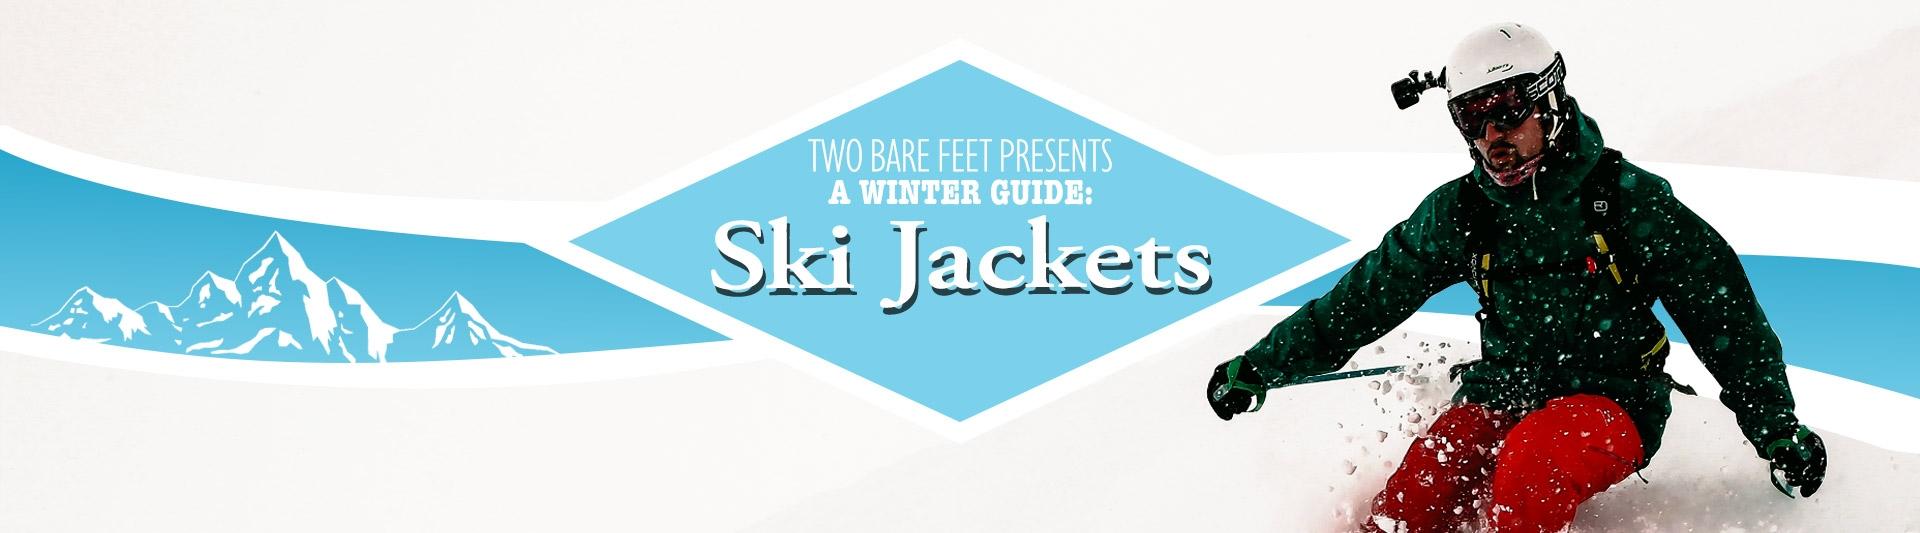 Men's ski jackets banner